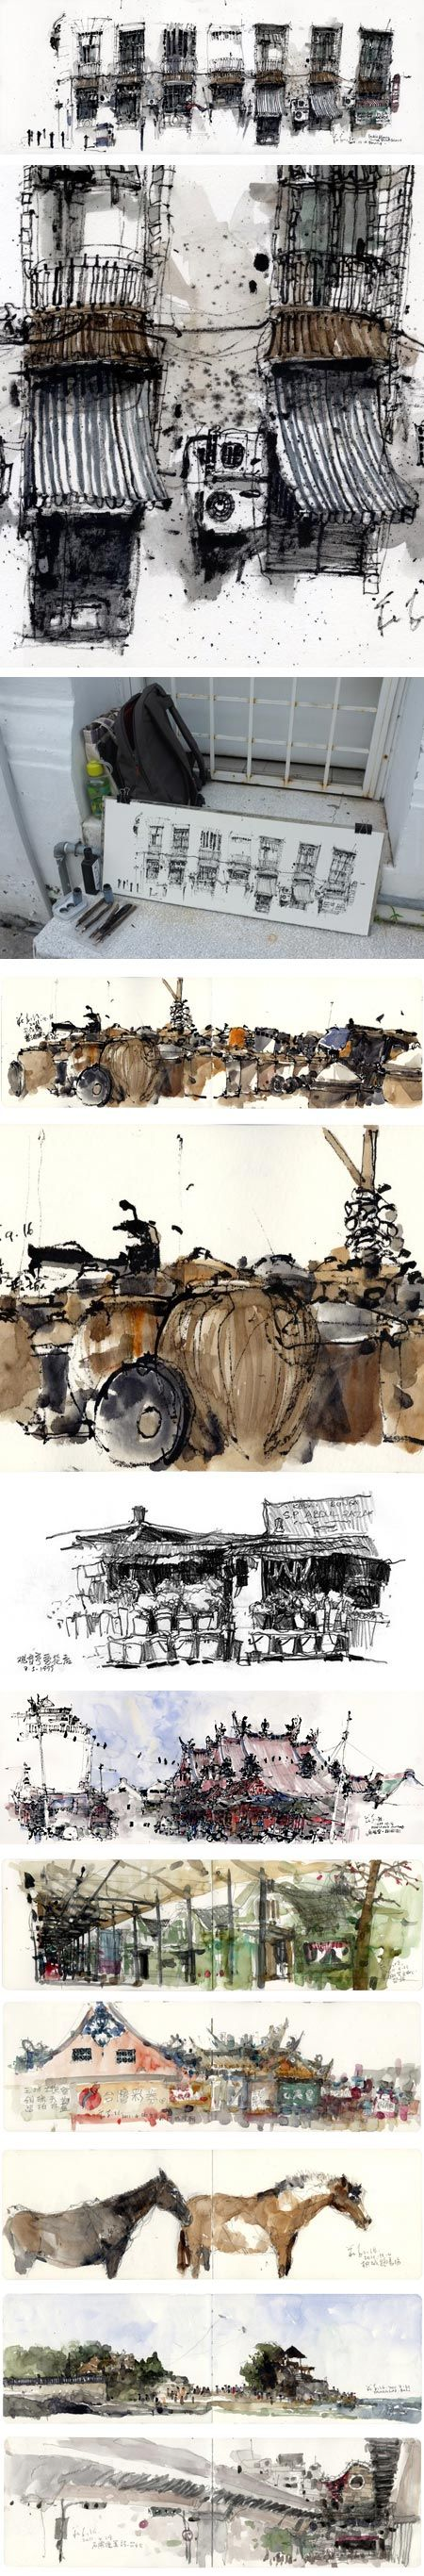 Kiah Kiean, how I wish my sketchbooks came out like this :(